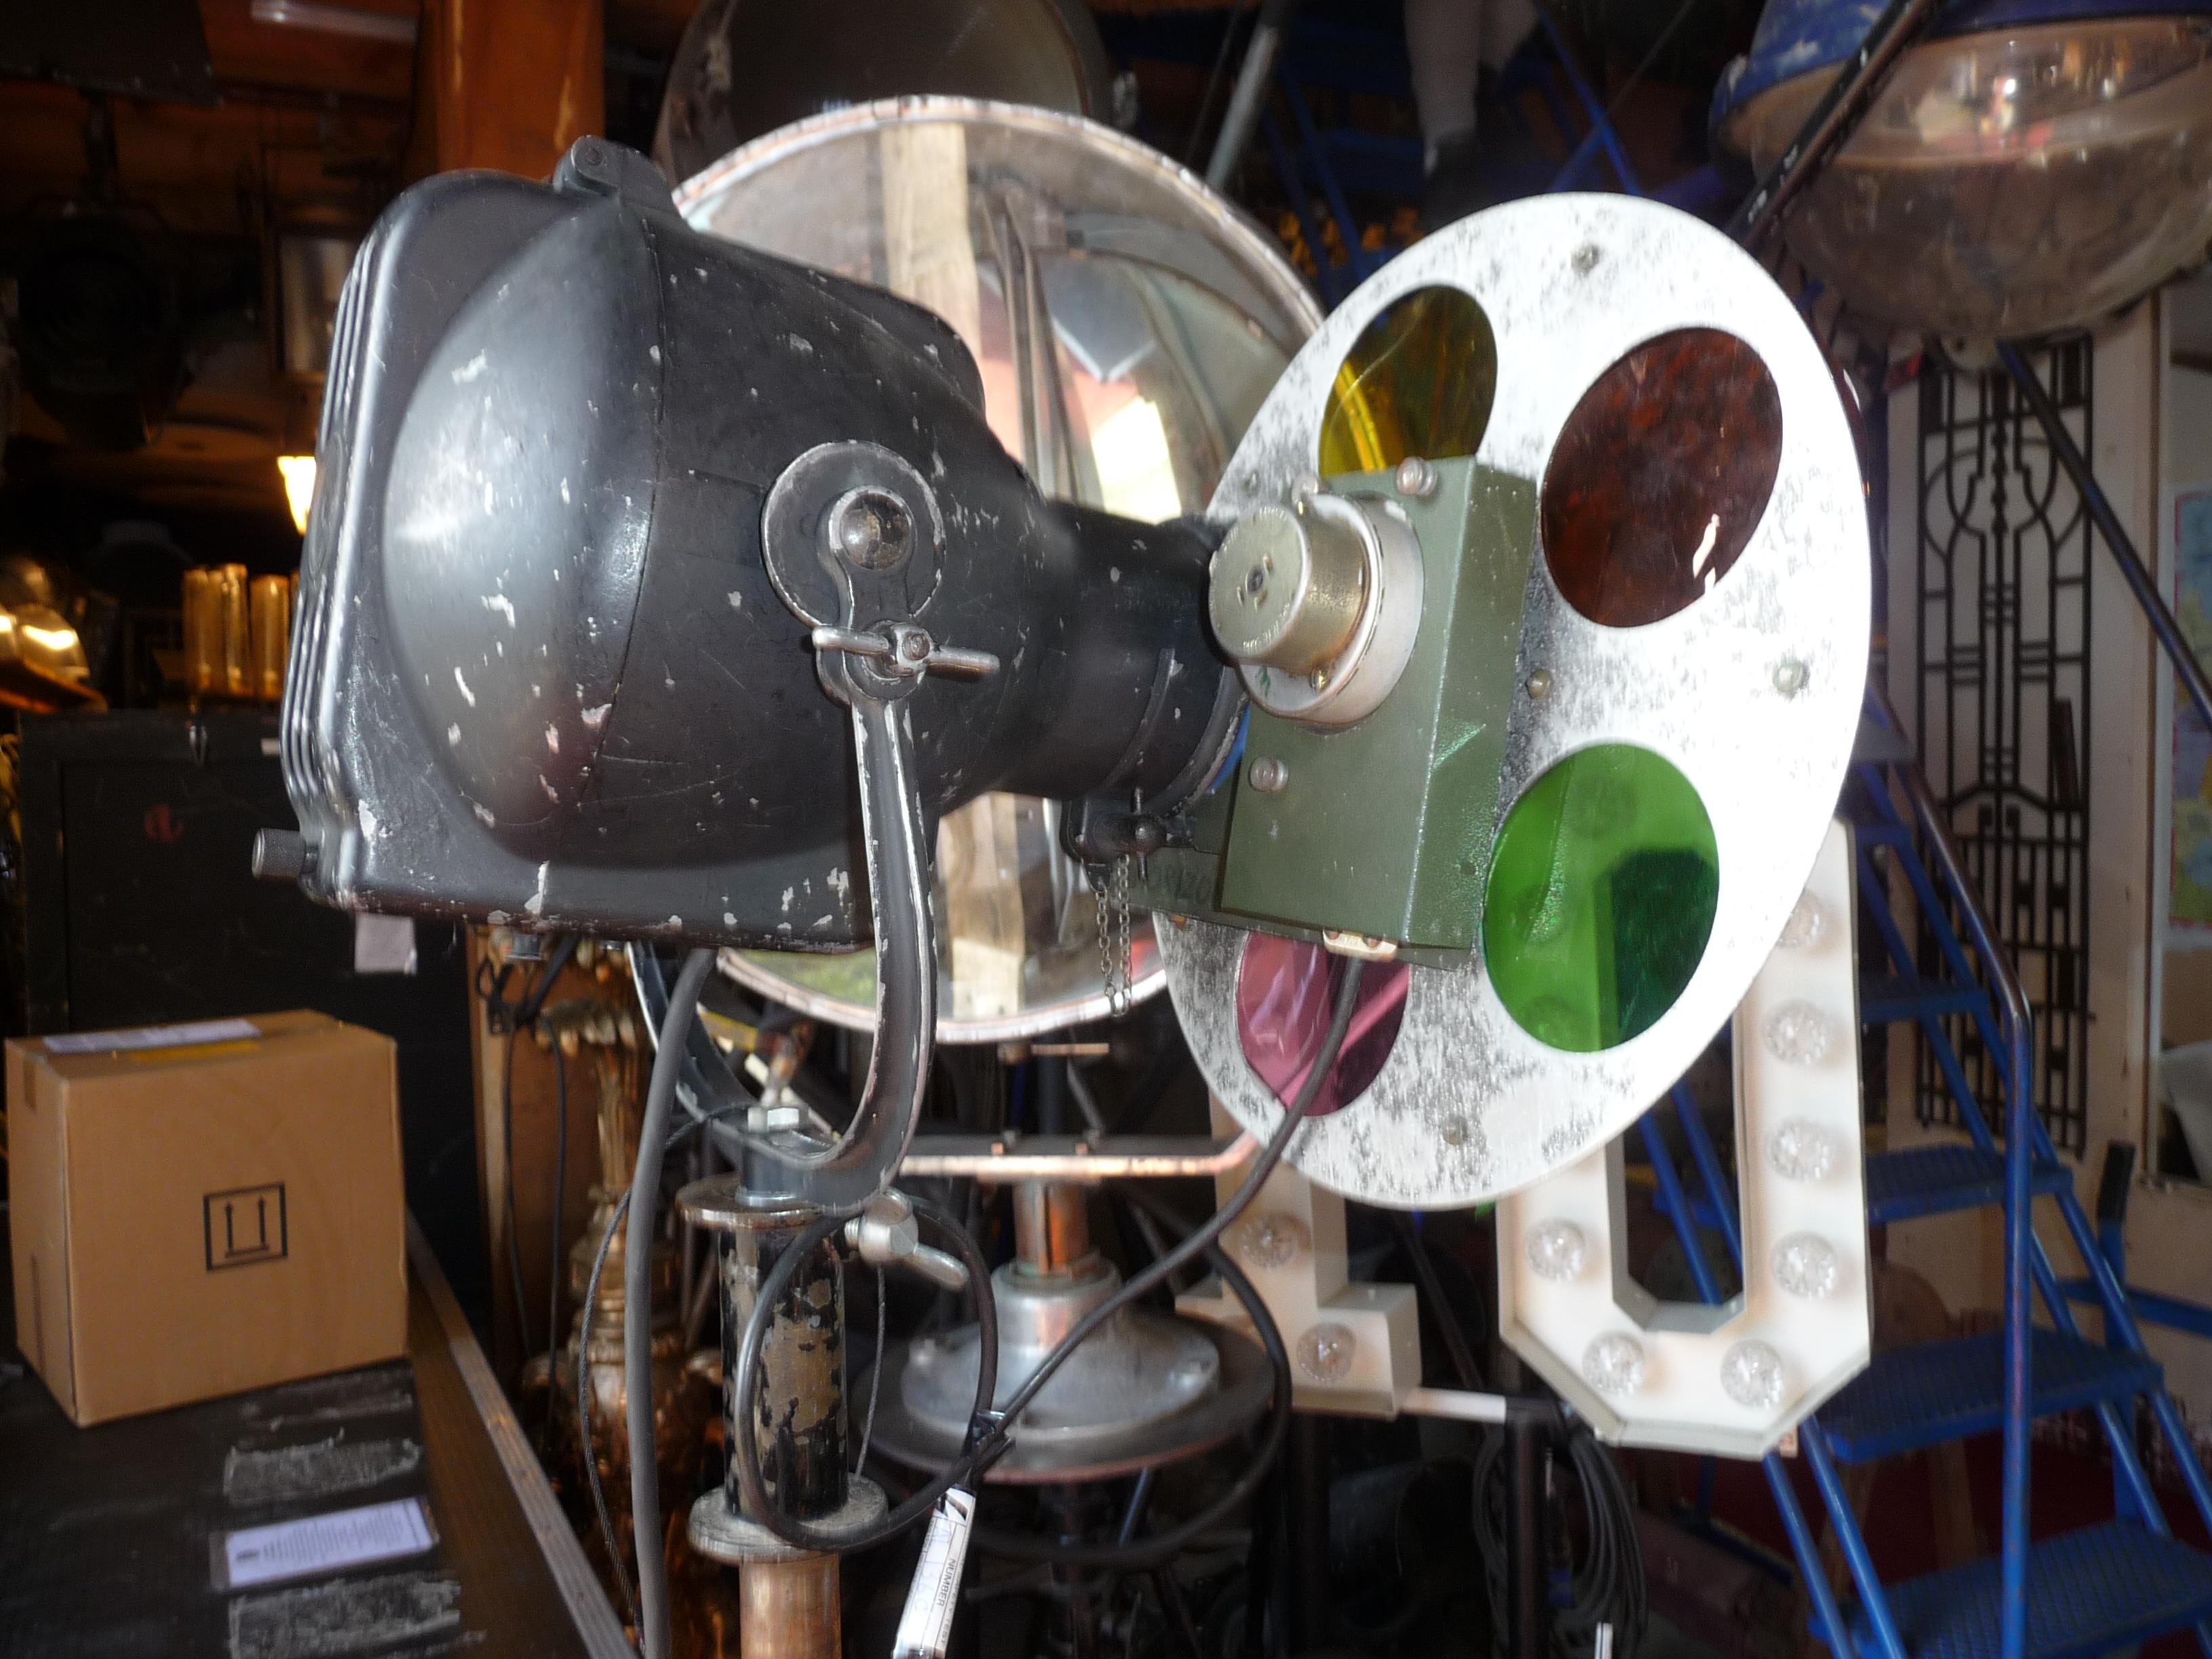 Patt 23 with Colour Wheel